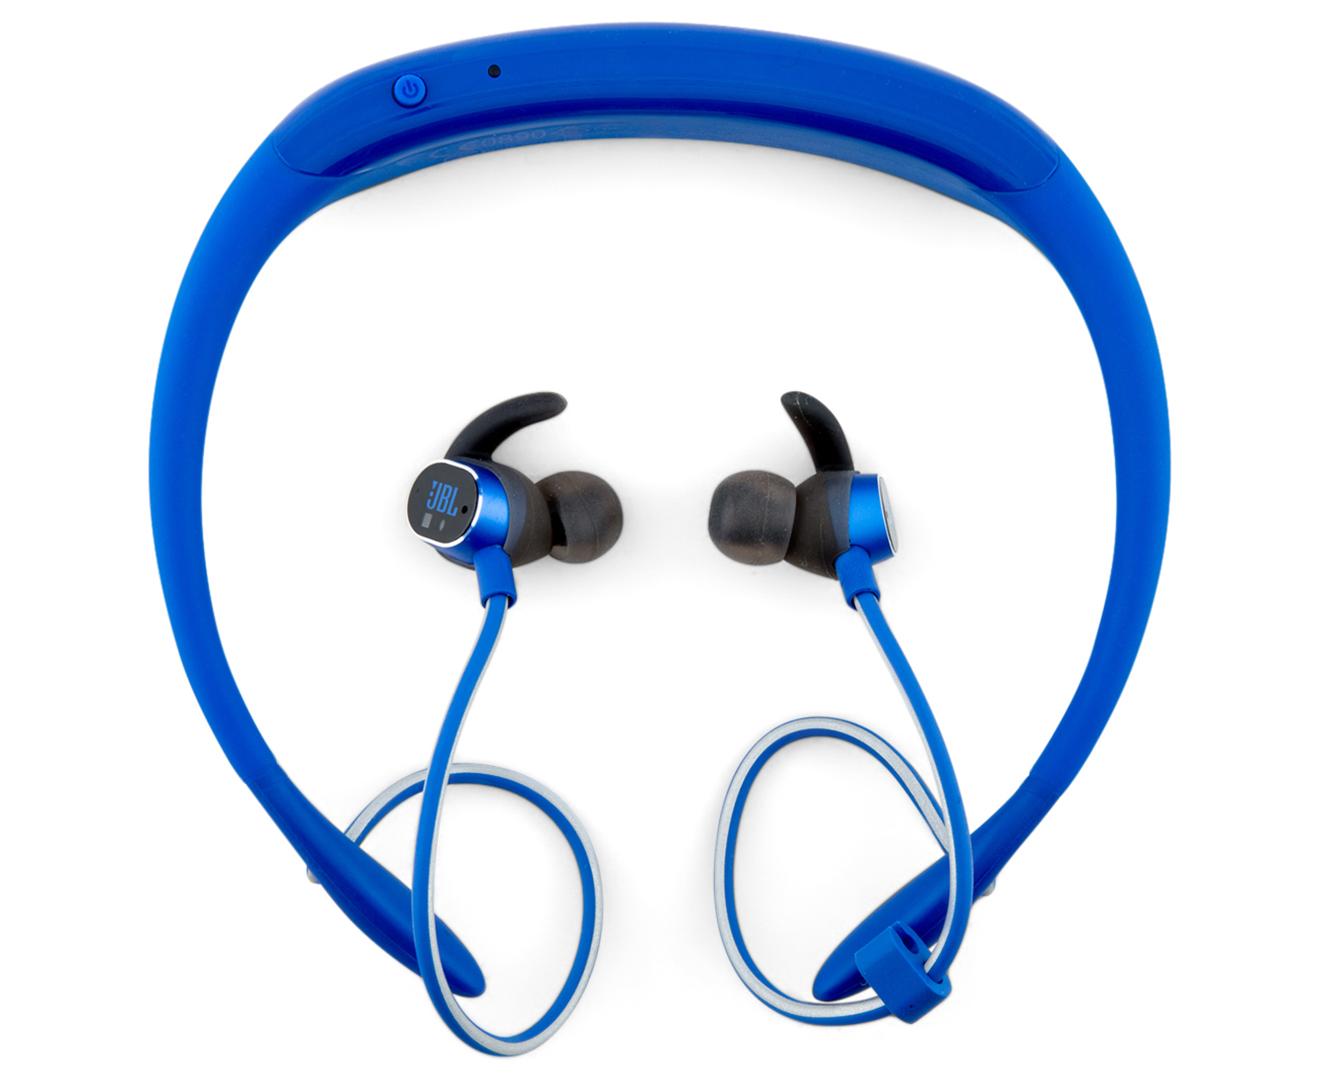 Tempat Jual Jbl Reflect Fit Heart Rate Wireless Headphones Blue Response Sport Bluetooth Headphone Biru Earphones